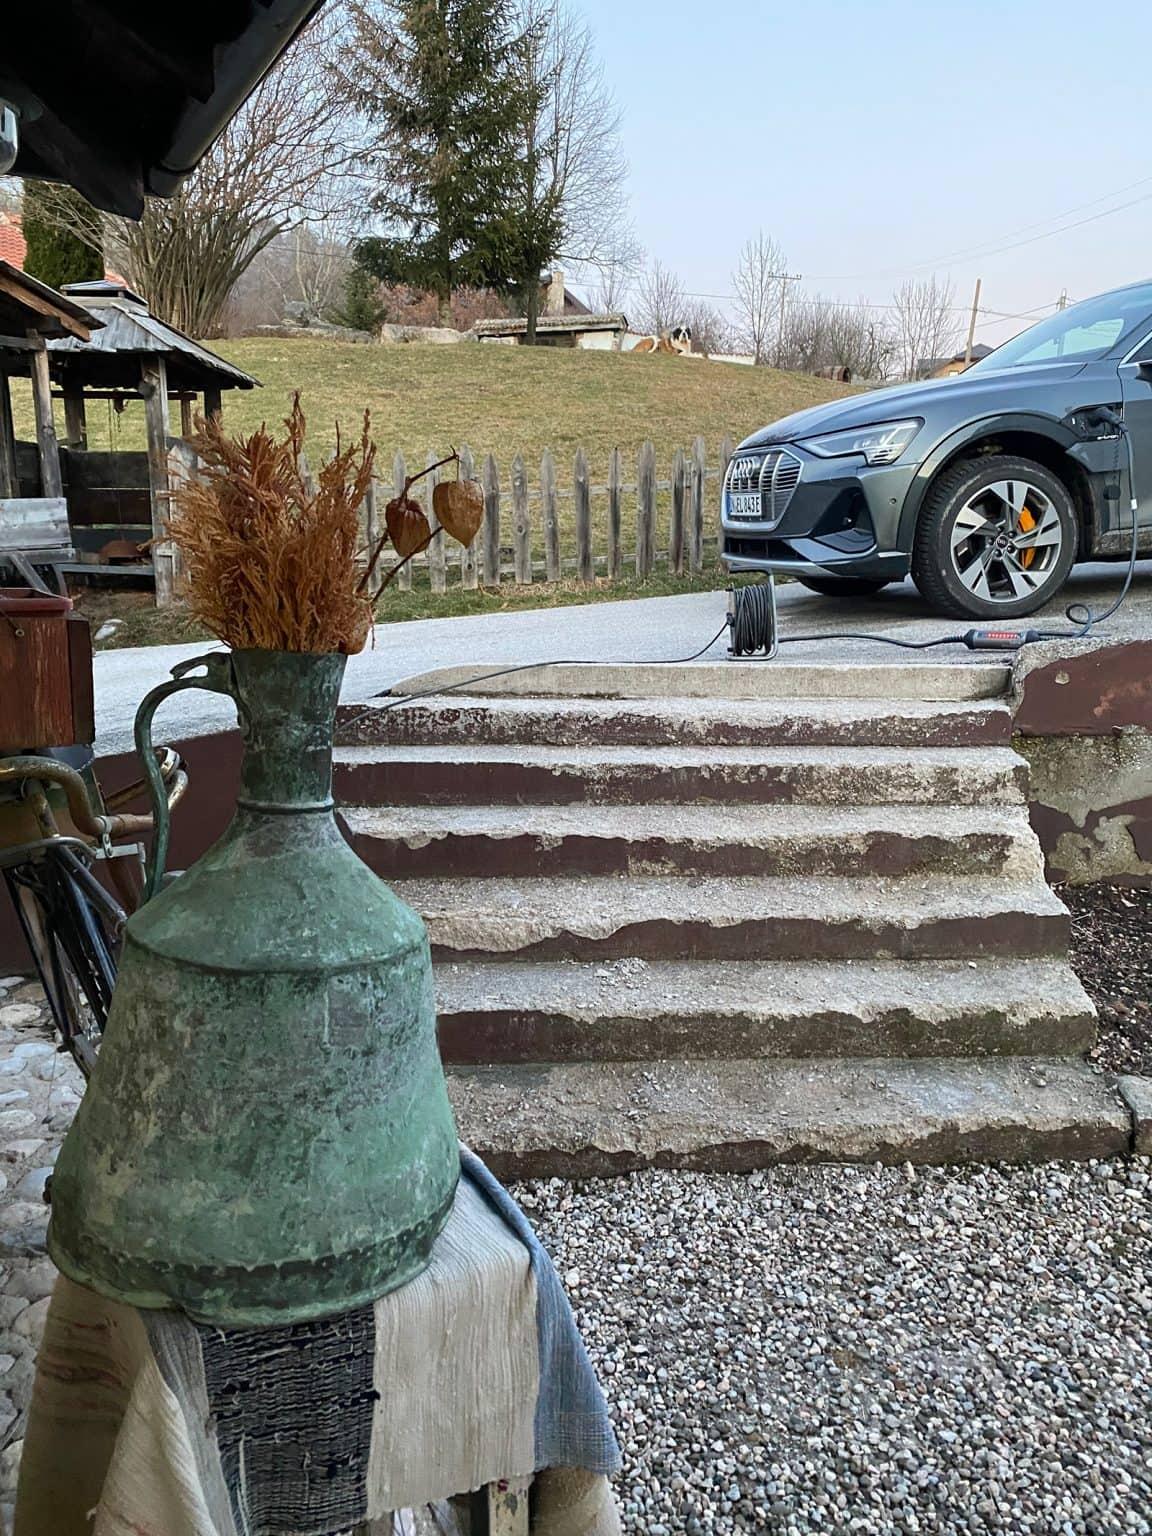 Audi-etron-erfahrungsbericht5